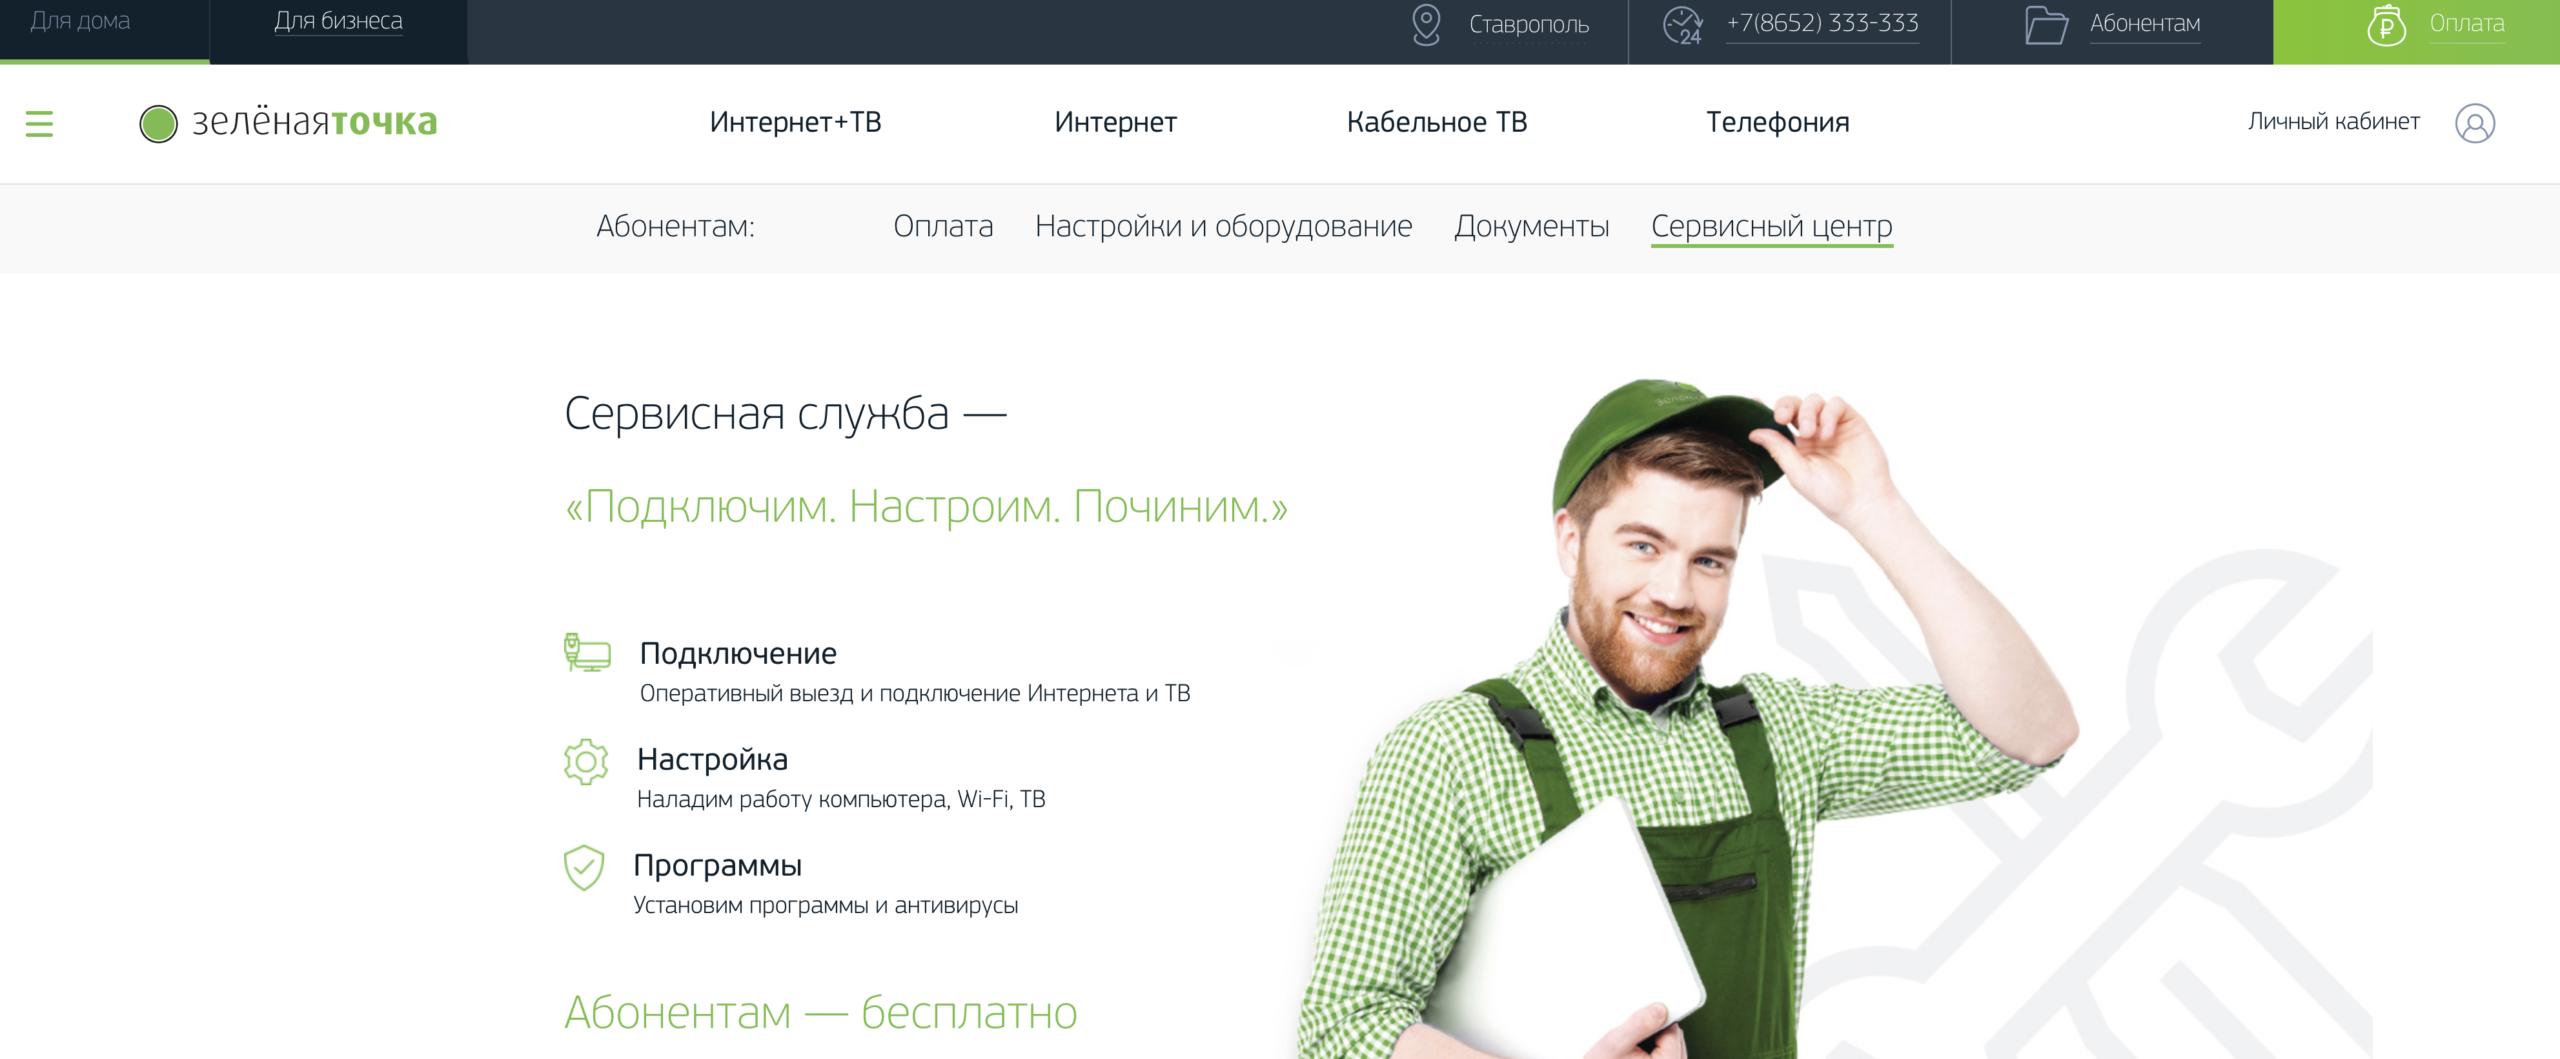 stavropol.zelenaya.net-servicecenter-scaled.png